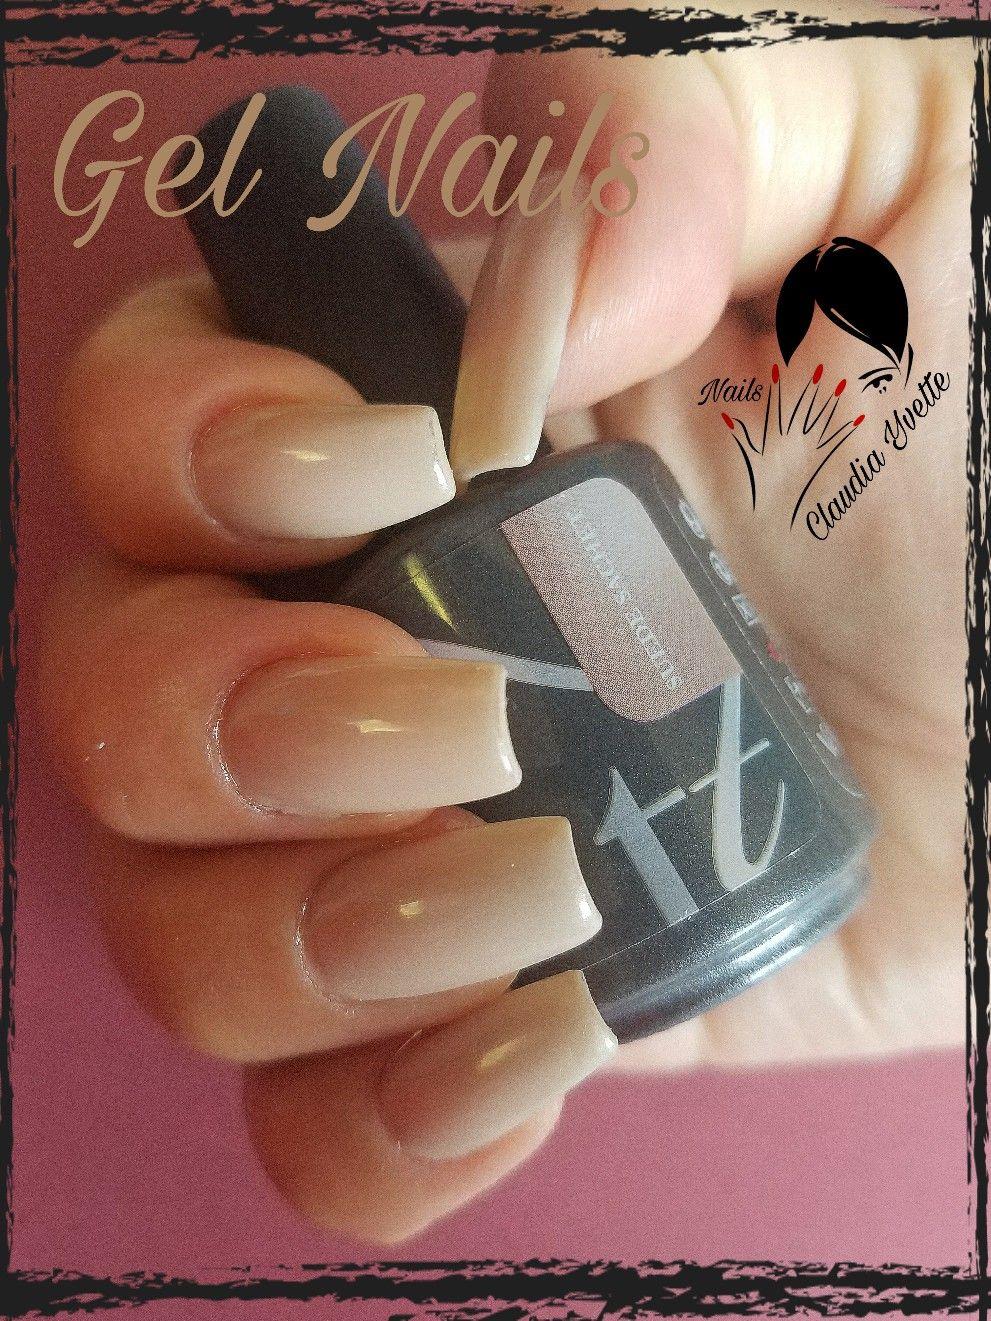 Entity 1 color Couture Suede Sachet Gel Polish Nails Claudia Yvette ...